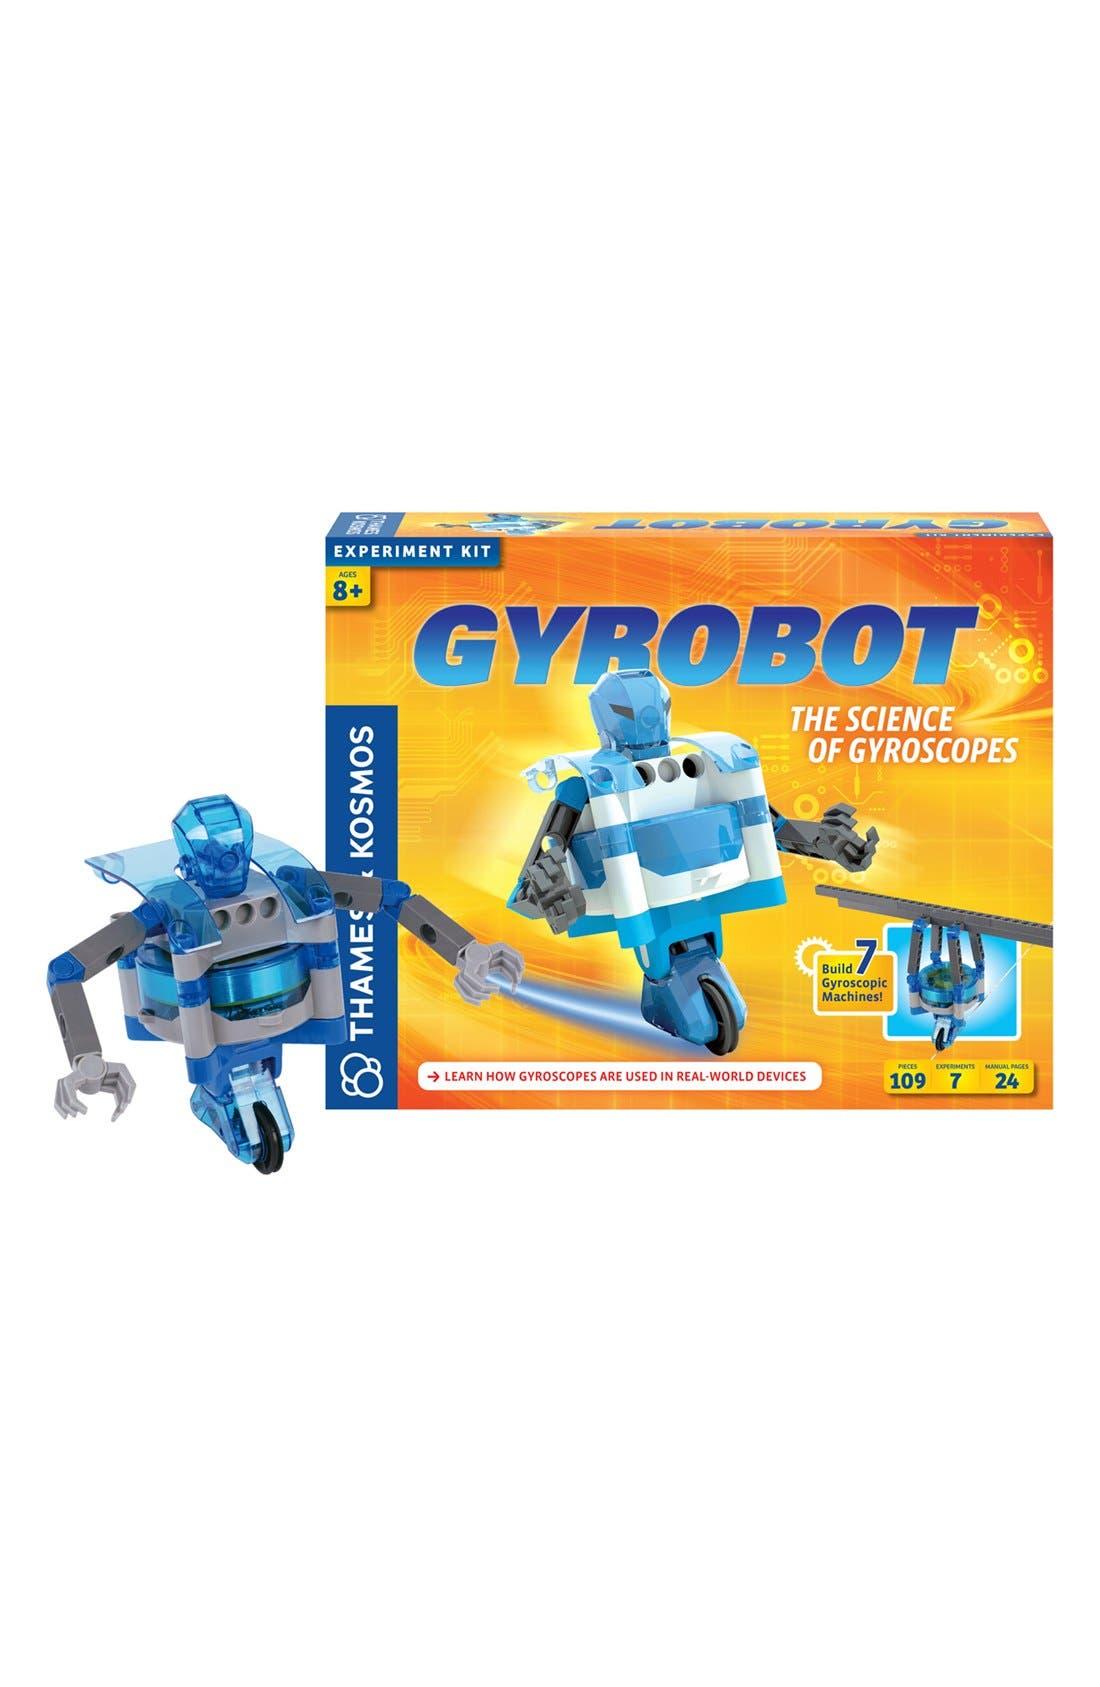 Thames & Kosmos 'Gyrobot' Experiment Kit